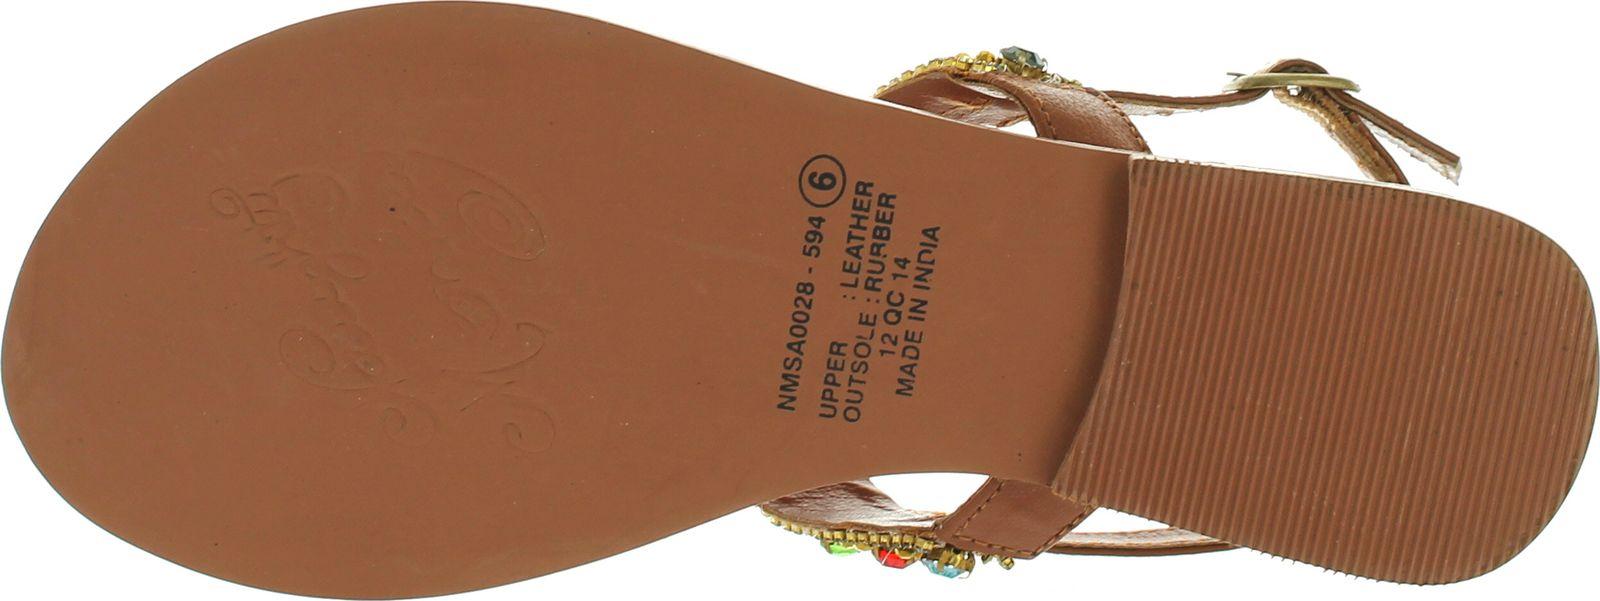 Naughty Naughty Naughty Monkey Donna  Festival Fairy Dress Sandal 66c99b